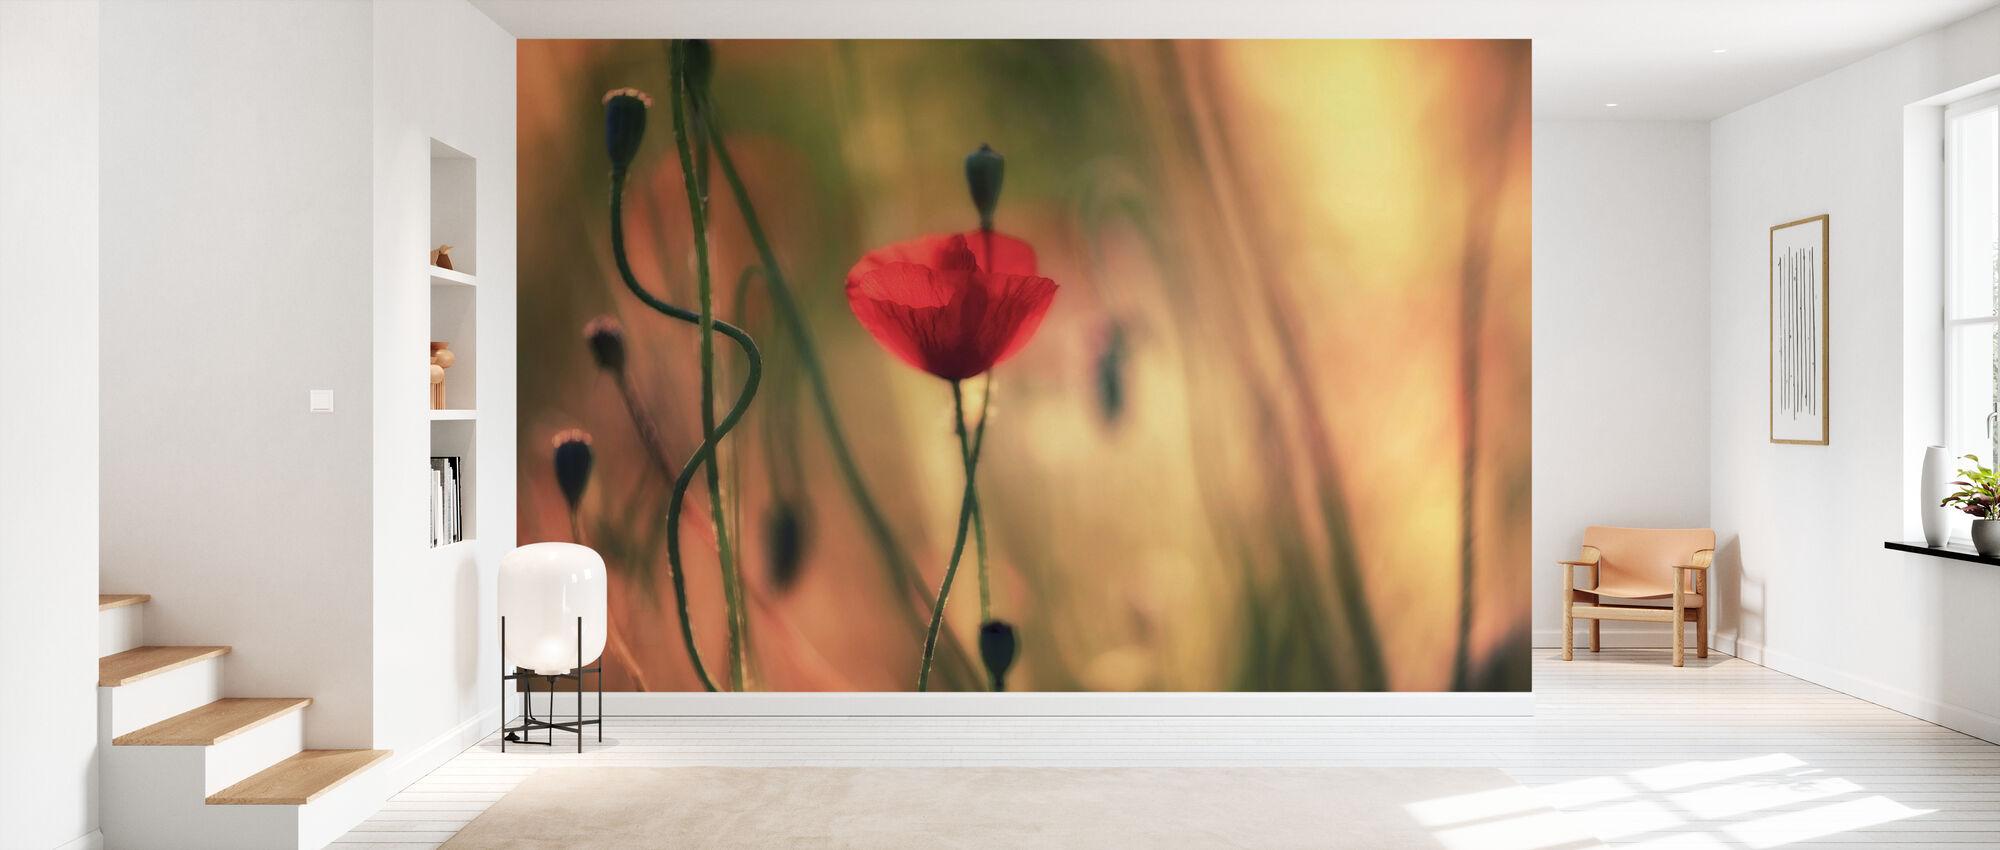 Red Poppy Flower - Wallpaper - Hallway